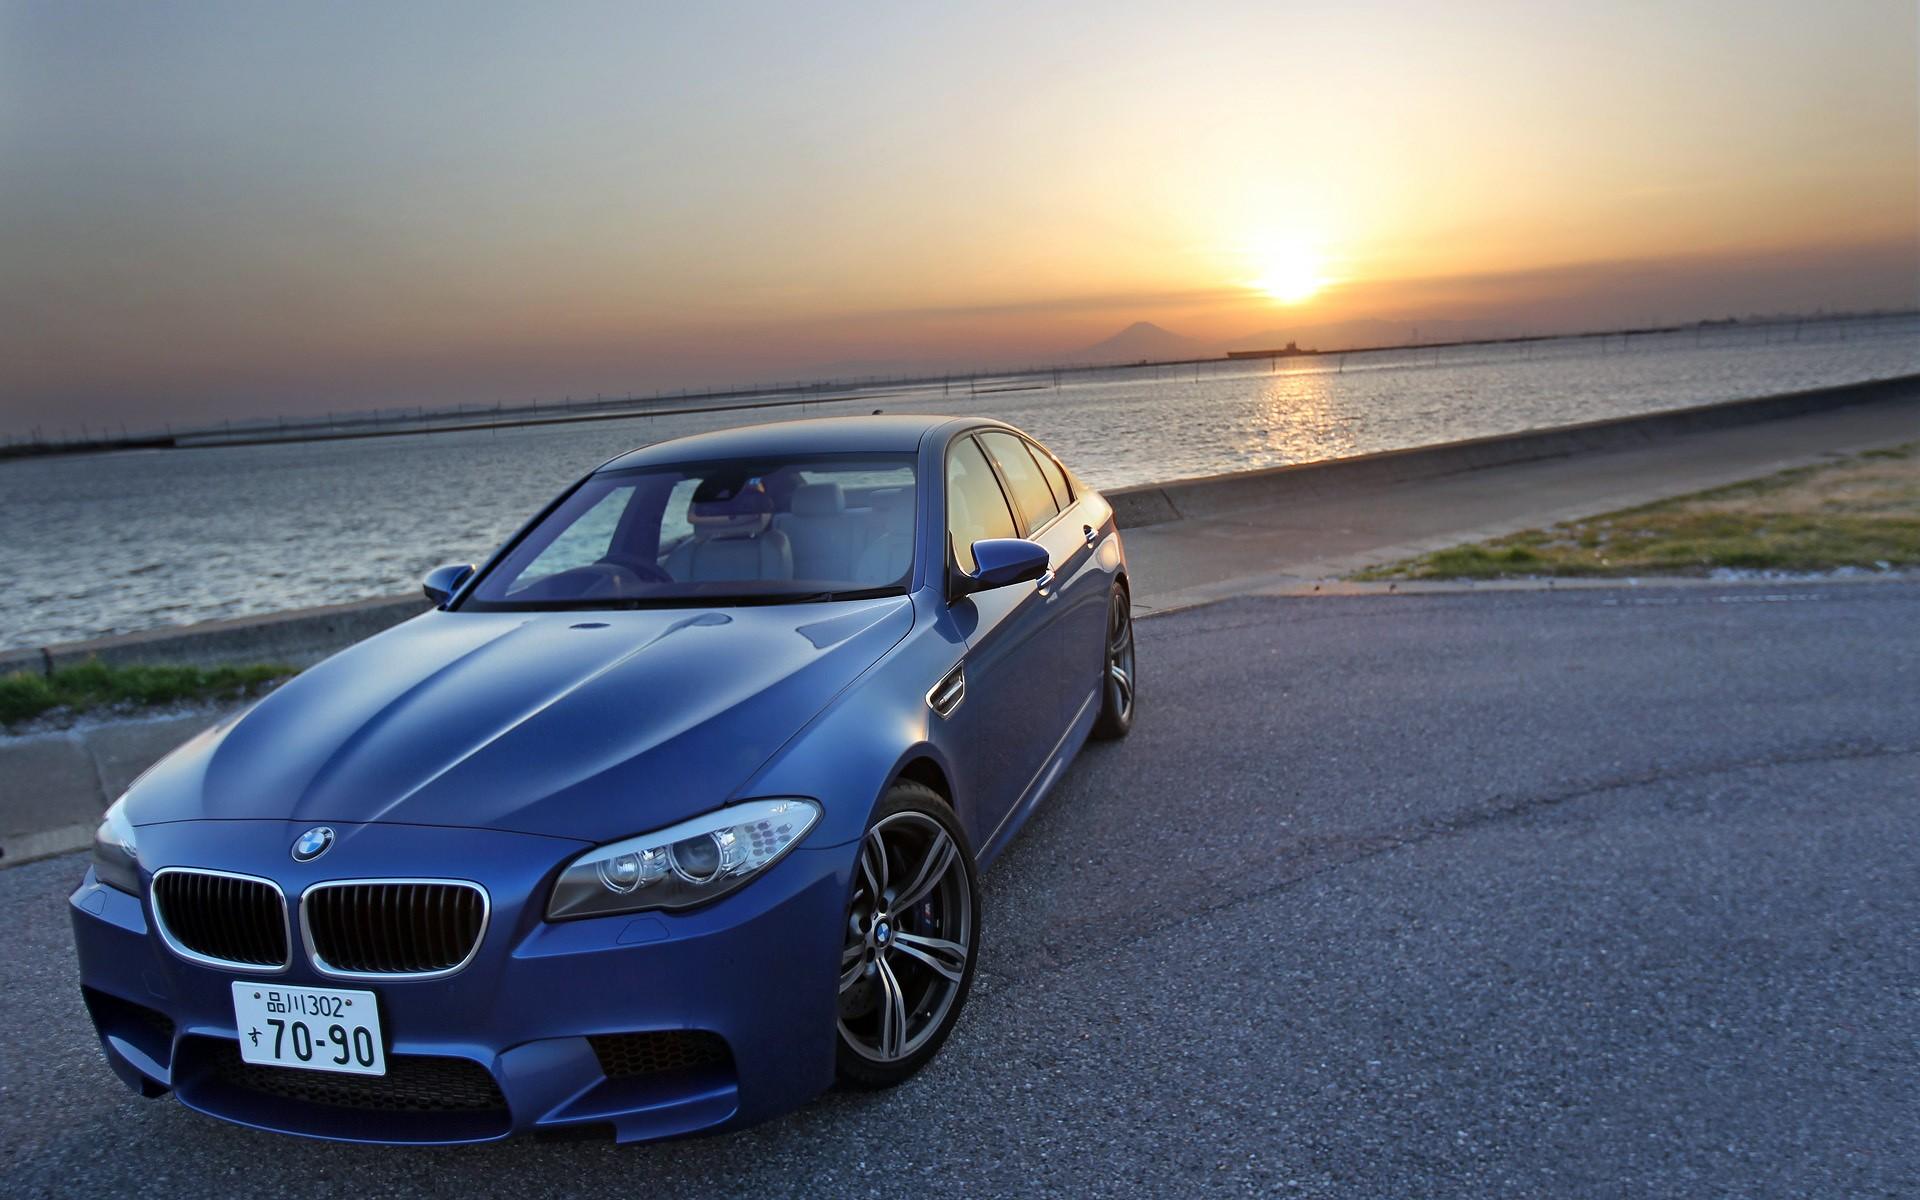 THE BMW M5 Wallpaper | HD Car Wallpapers | ID #2672